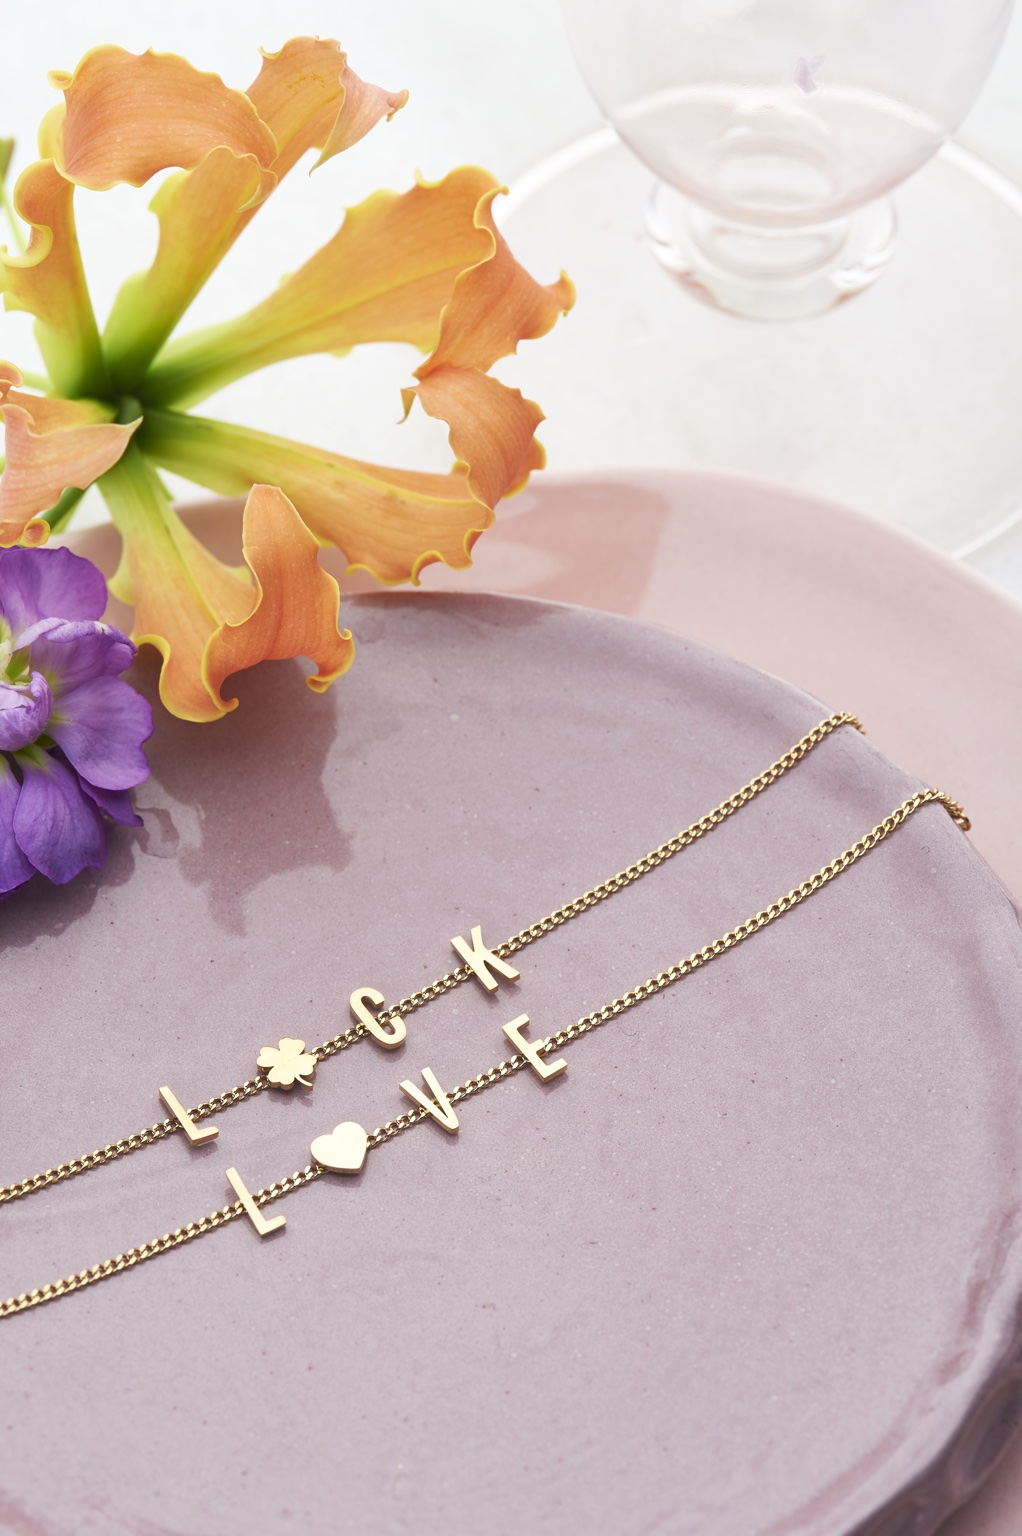 My Jewellery - My-09